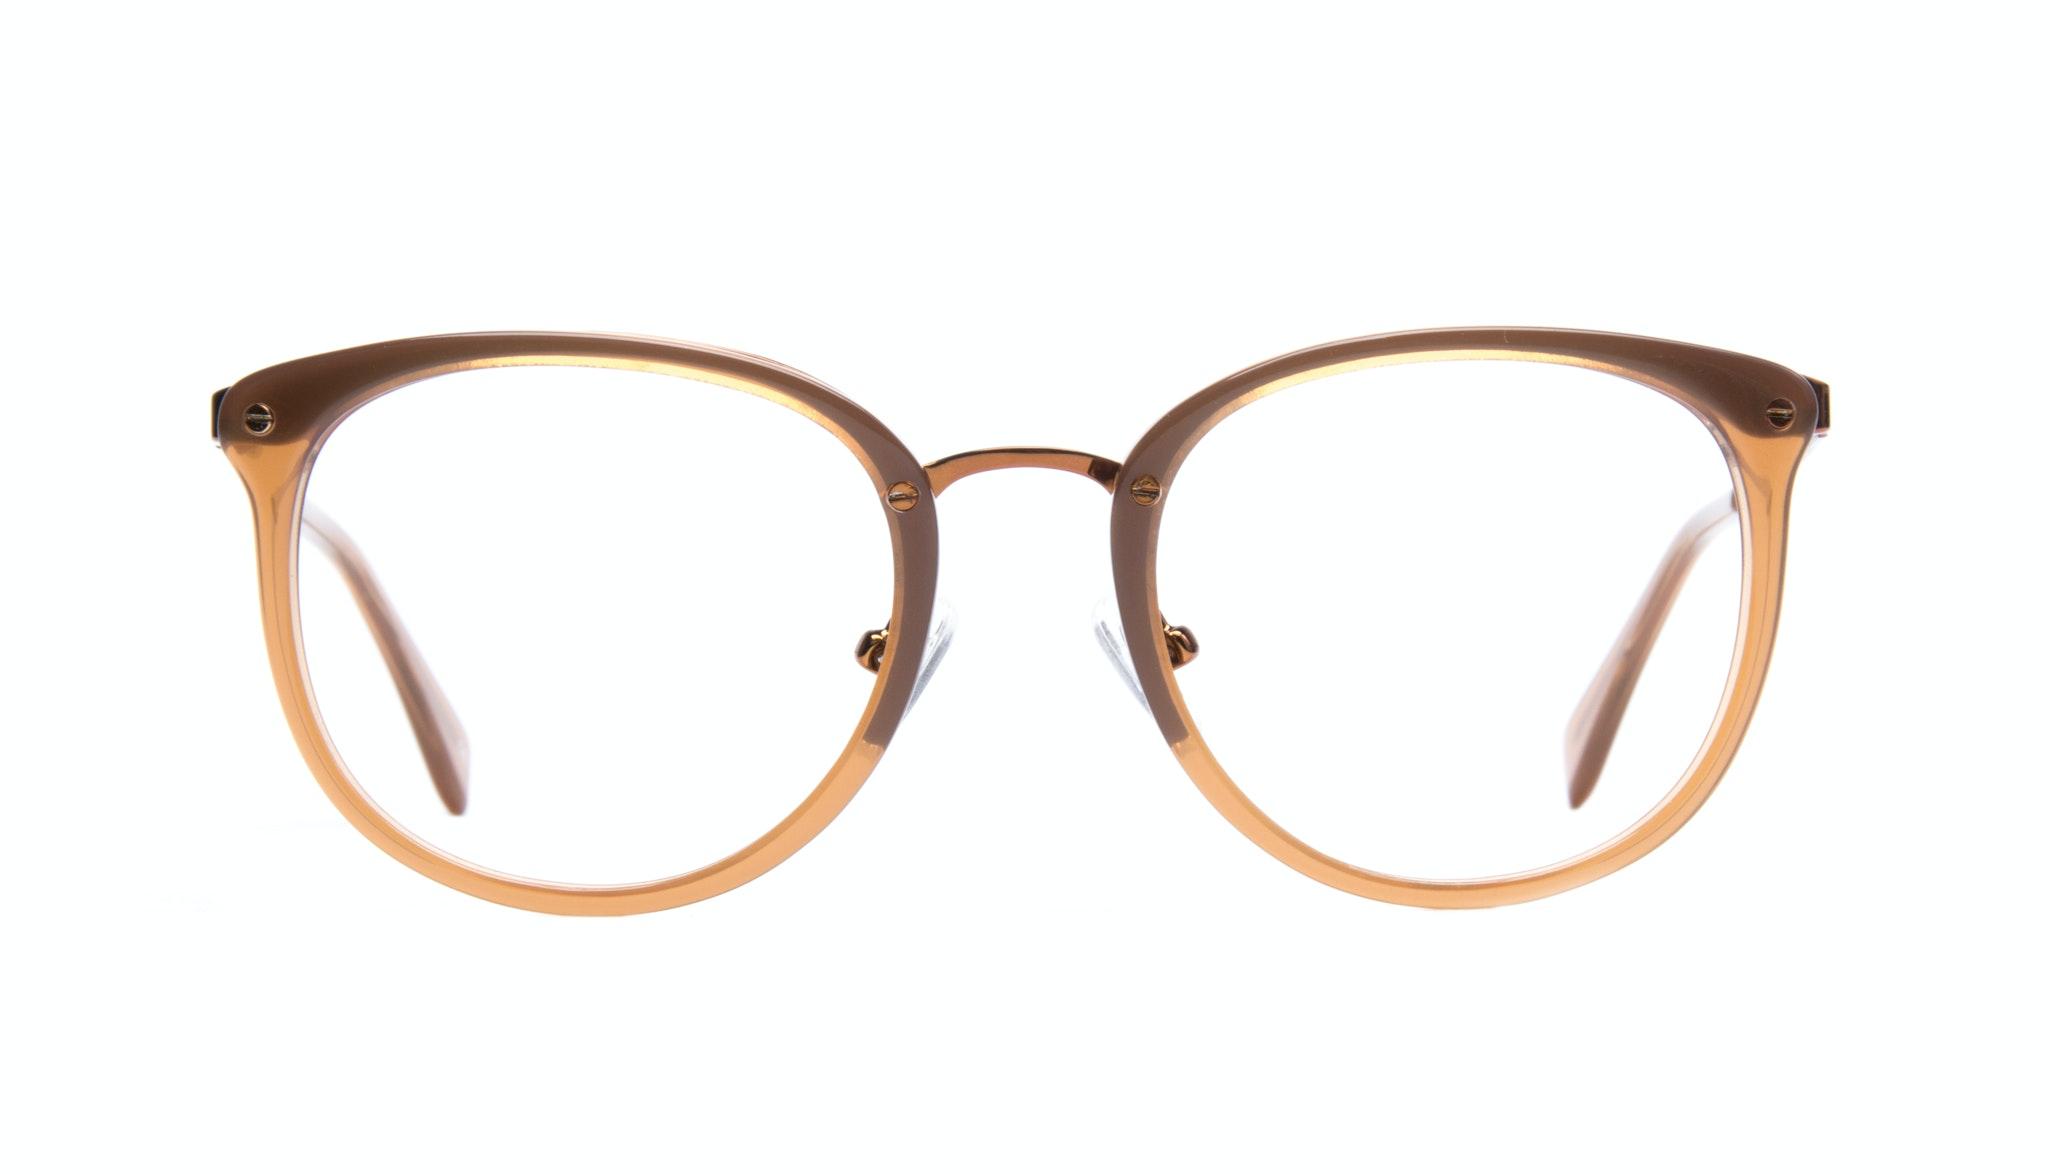 Affordable Fashion Glasses Round Eyeglasses Women Amaze Tan